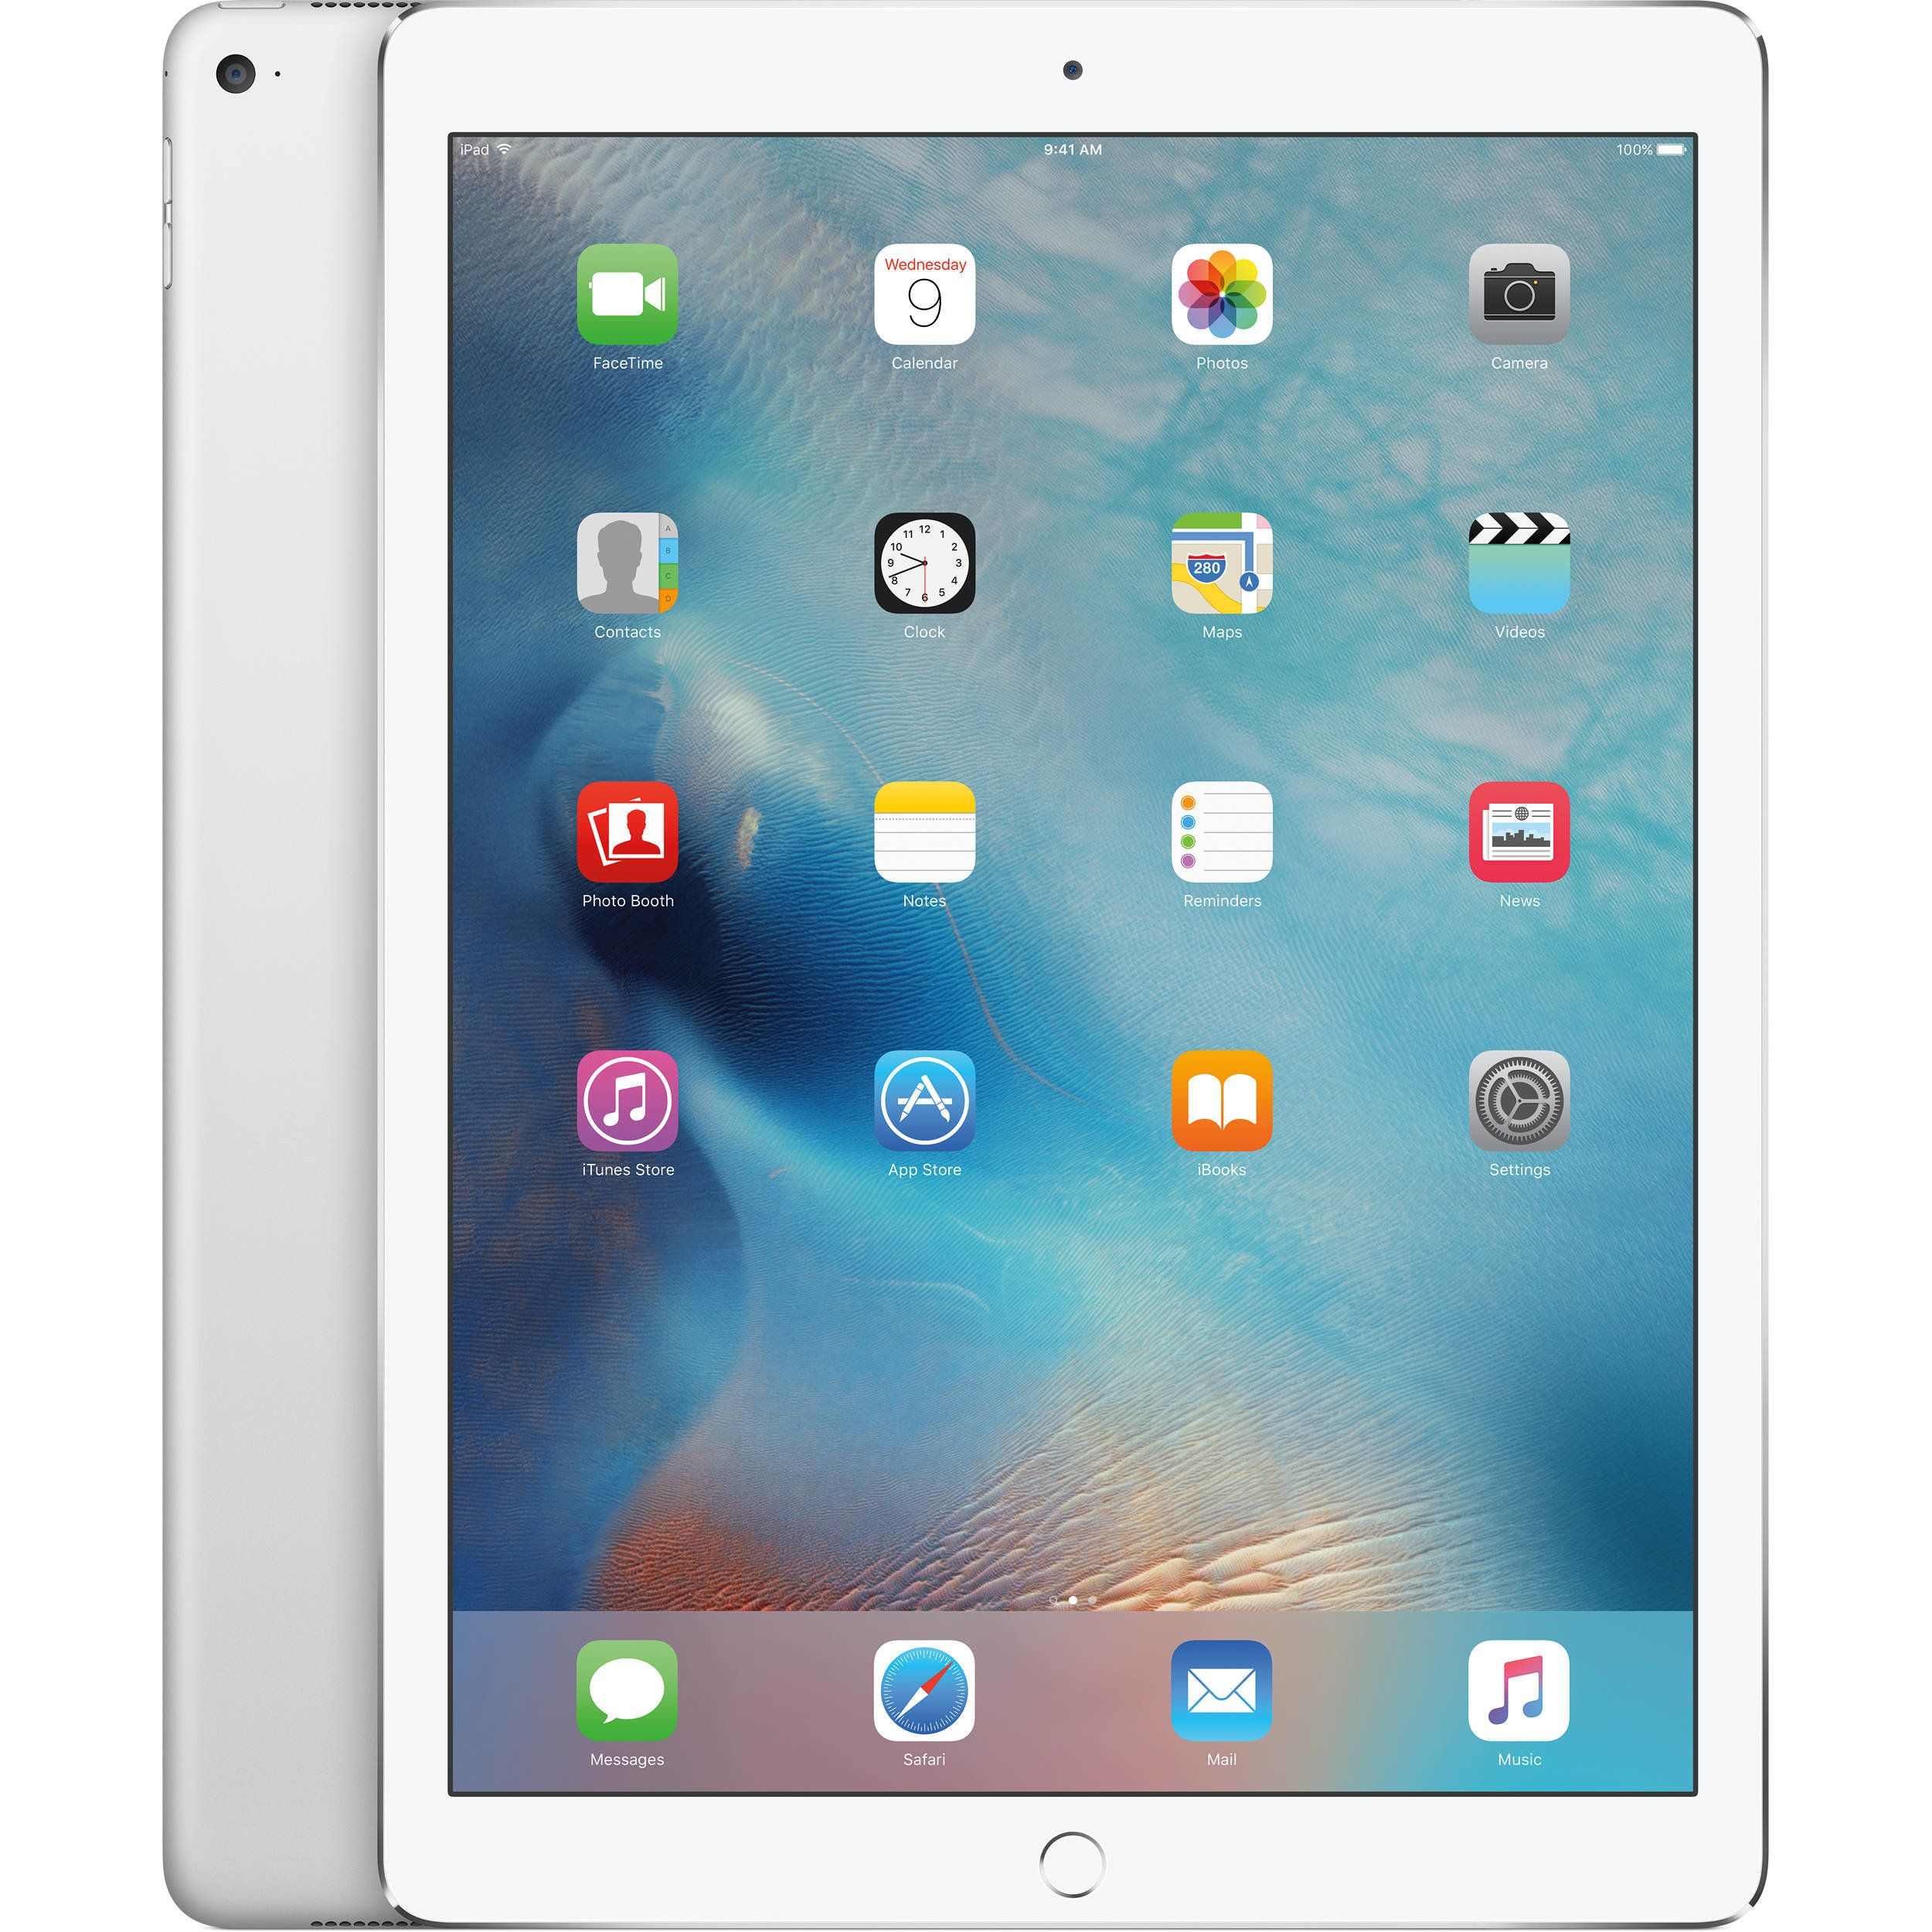 Apple Ipad Pro Ml2j2hc A 128 Gb 12 9 Apple Ipad Pro Ipad Pro Refurbished Ipad